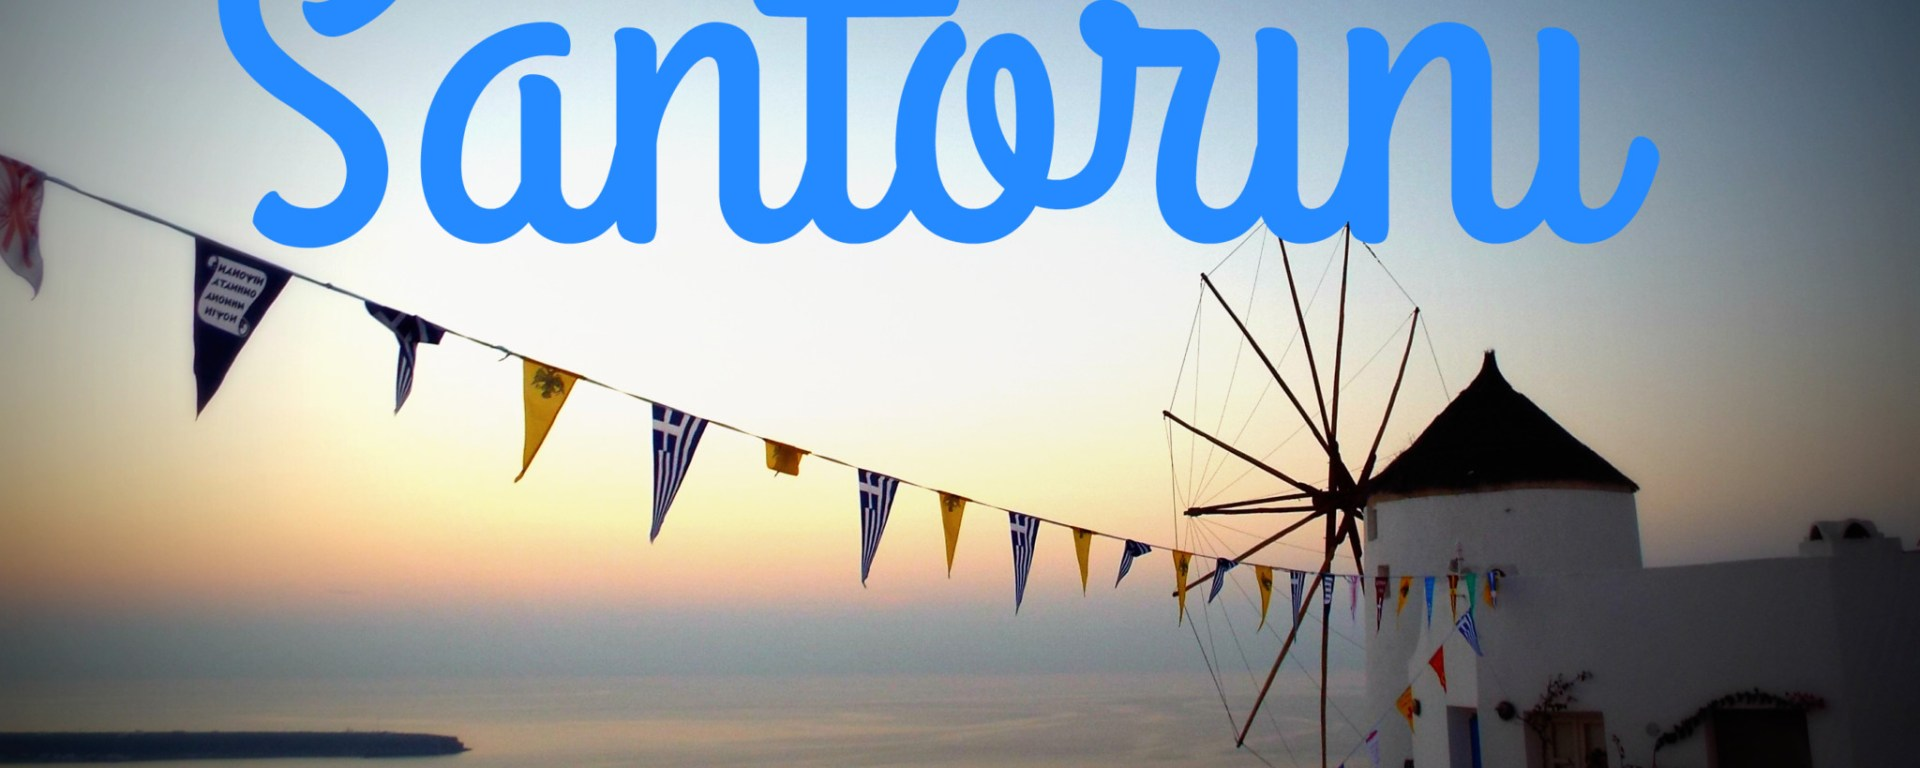 10 Fun Things to Do on Santorini